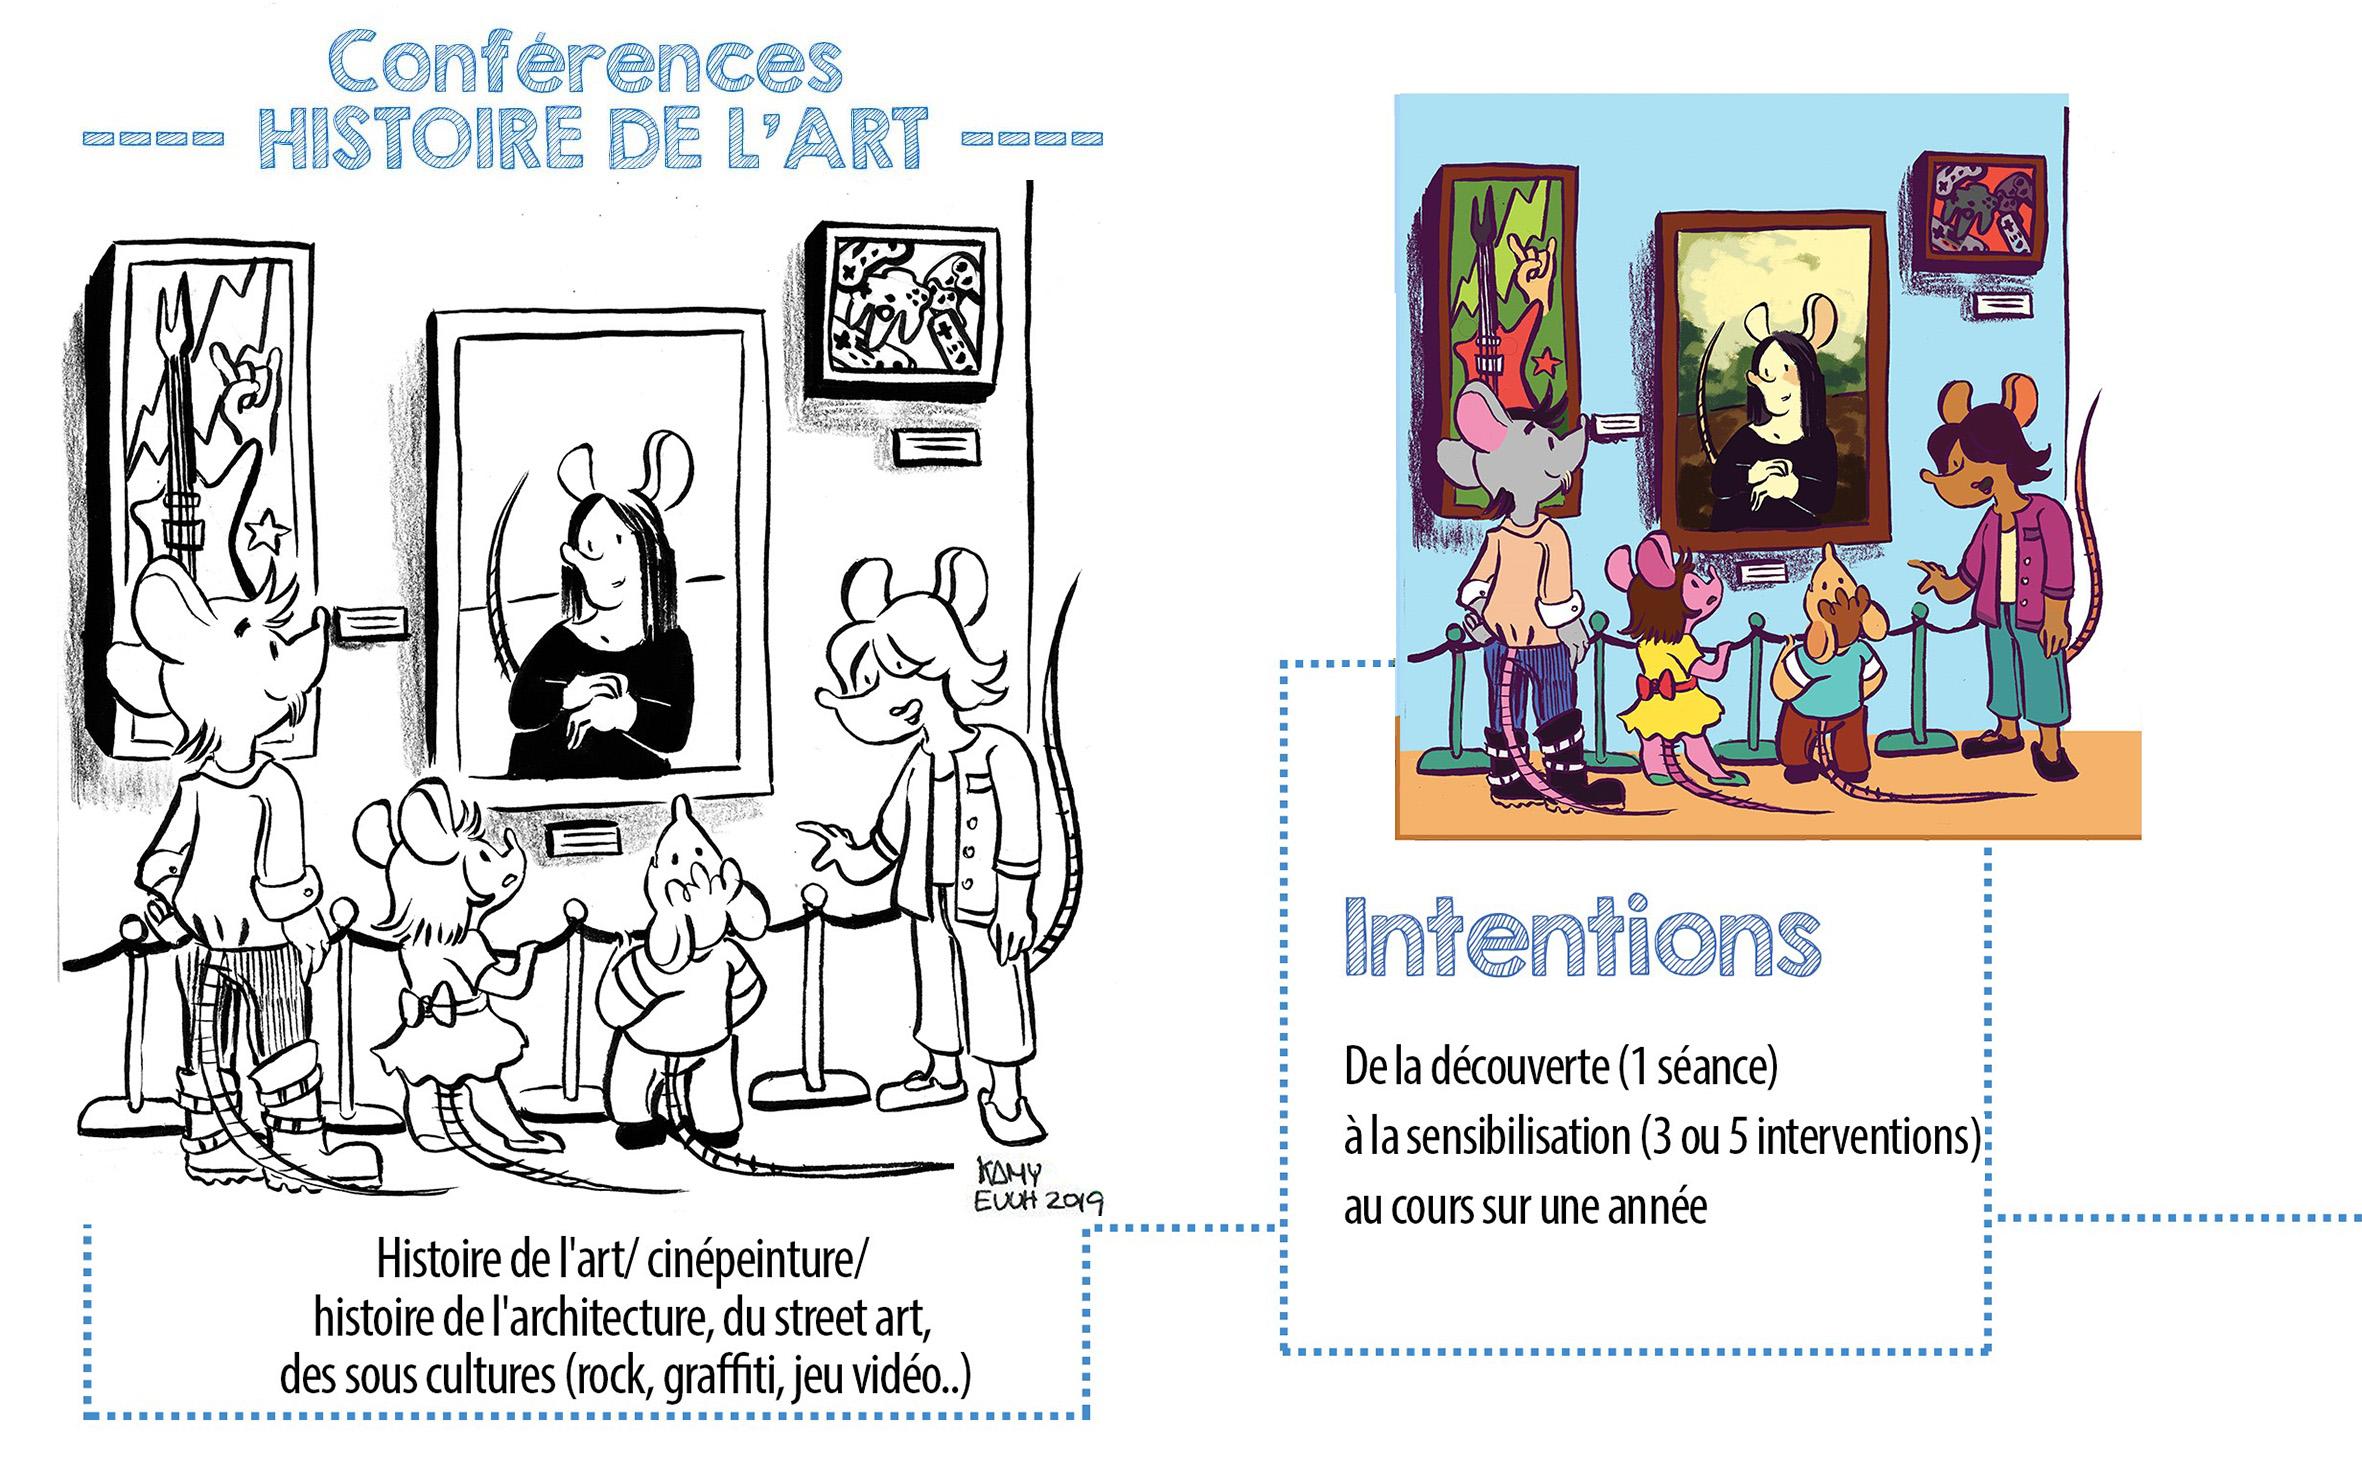 bandeau-activites-conferences-HDA-PREFIGURATIONS-V2